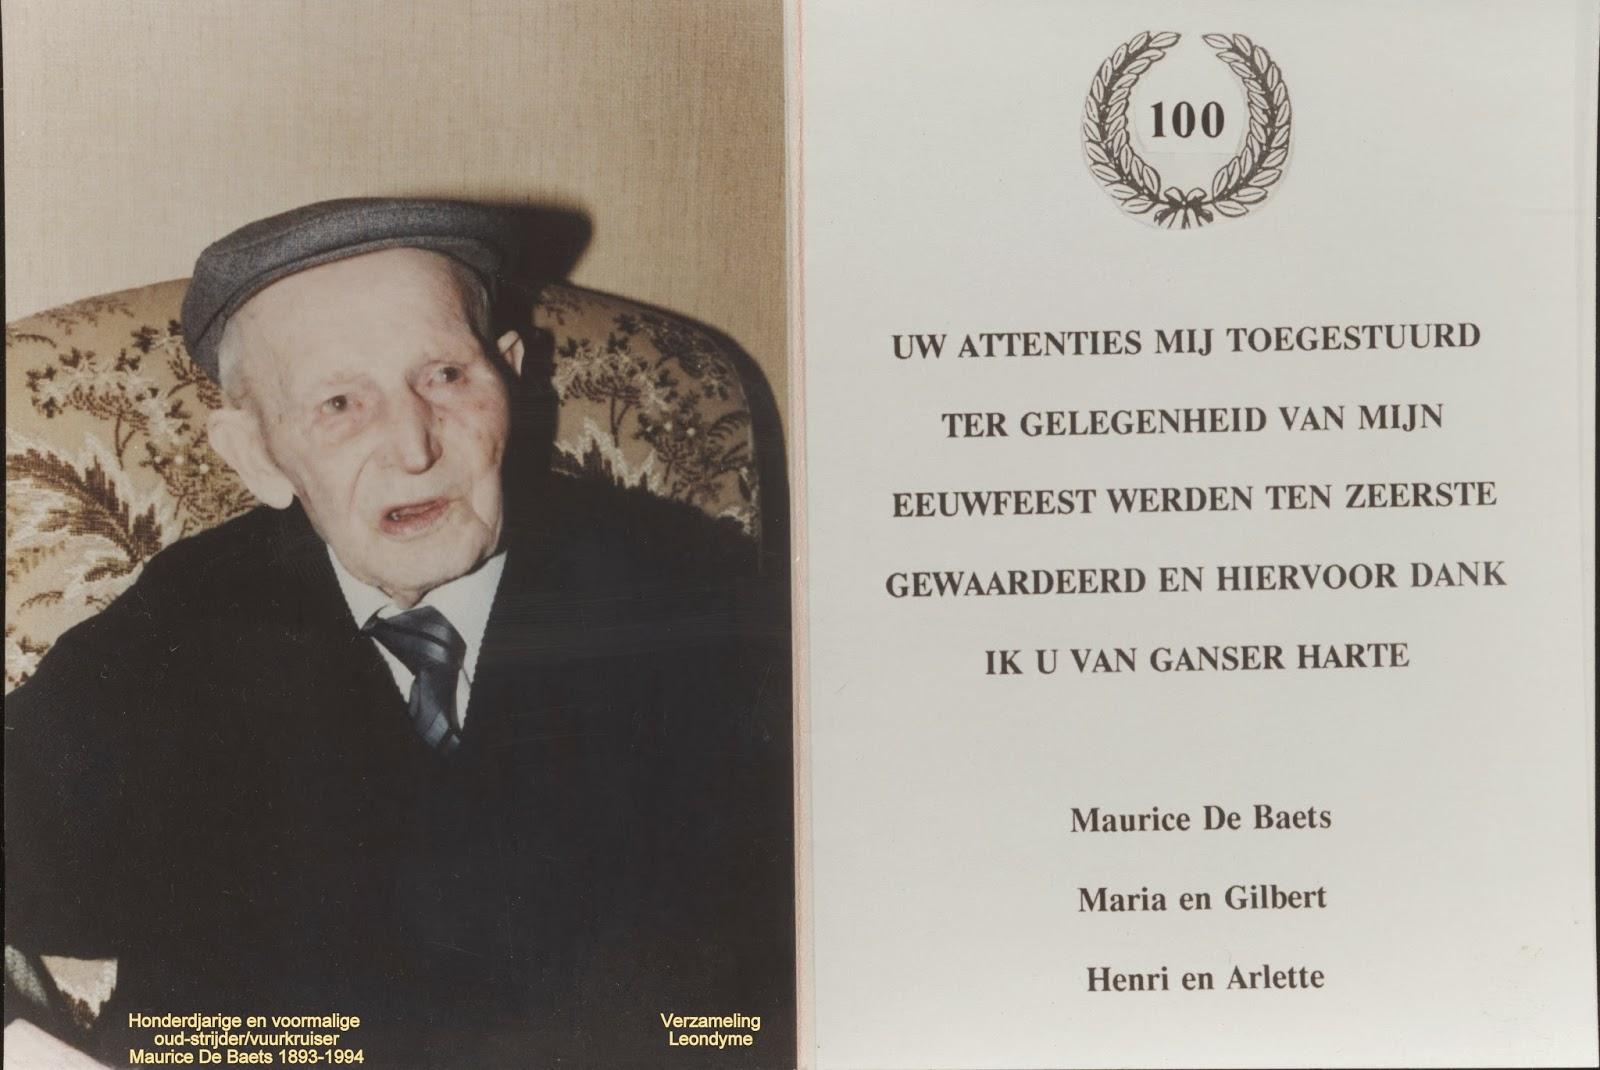 Bedankingskaart van de honderdjarige Maurice De Baets 1893-1994. Verzameling Leondyme.